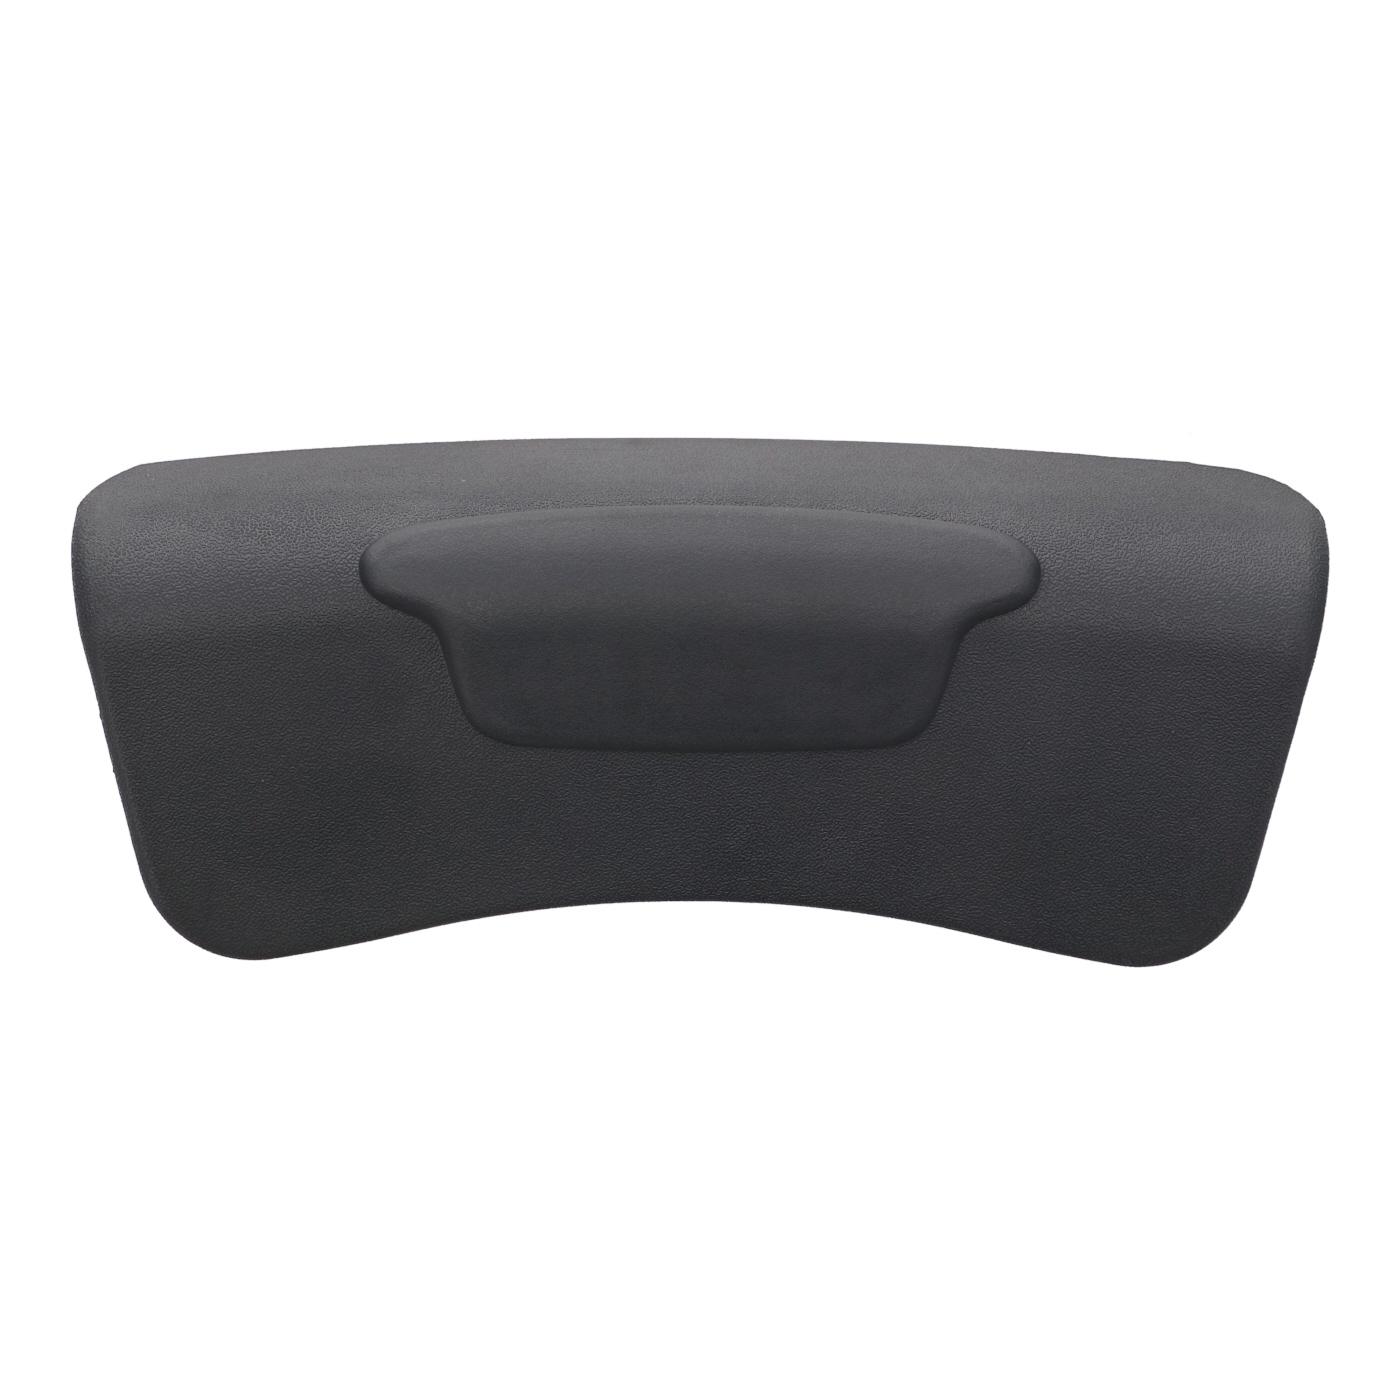 KB261 Straight Spa Headrest